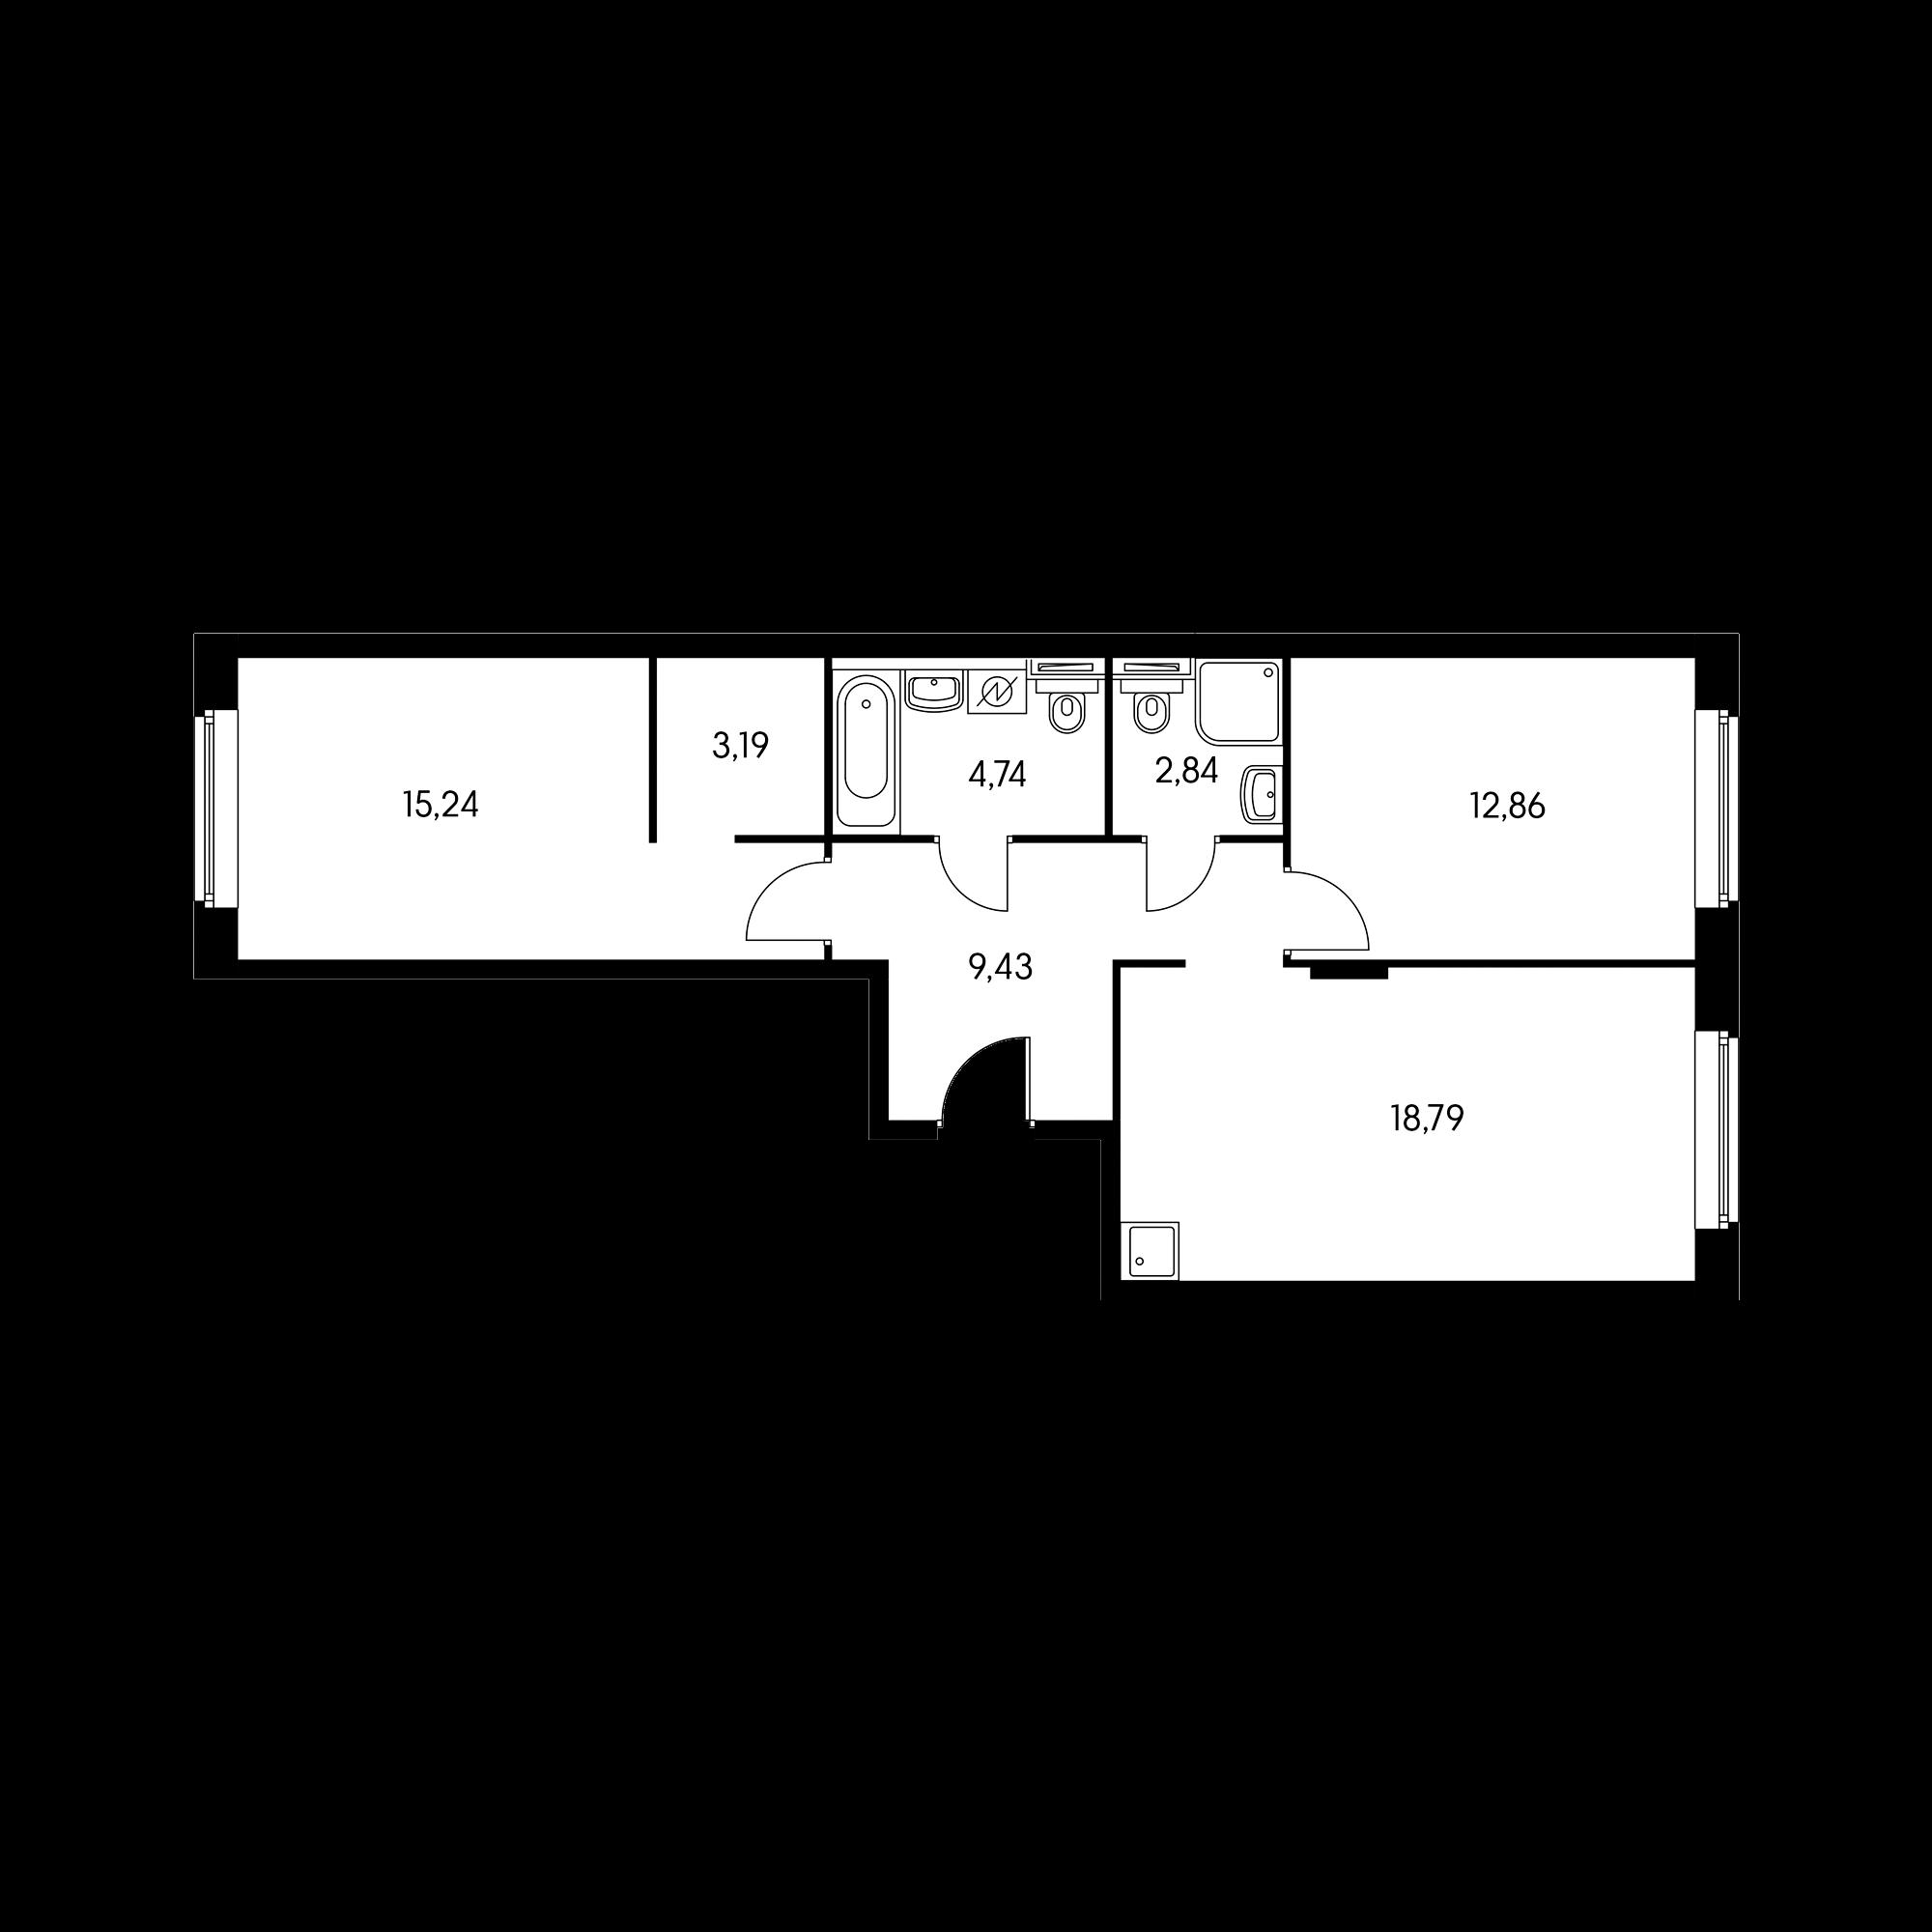 2EL3_6.6-1